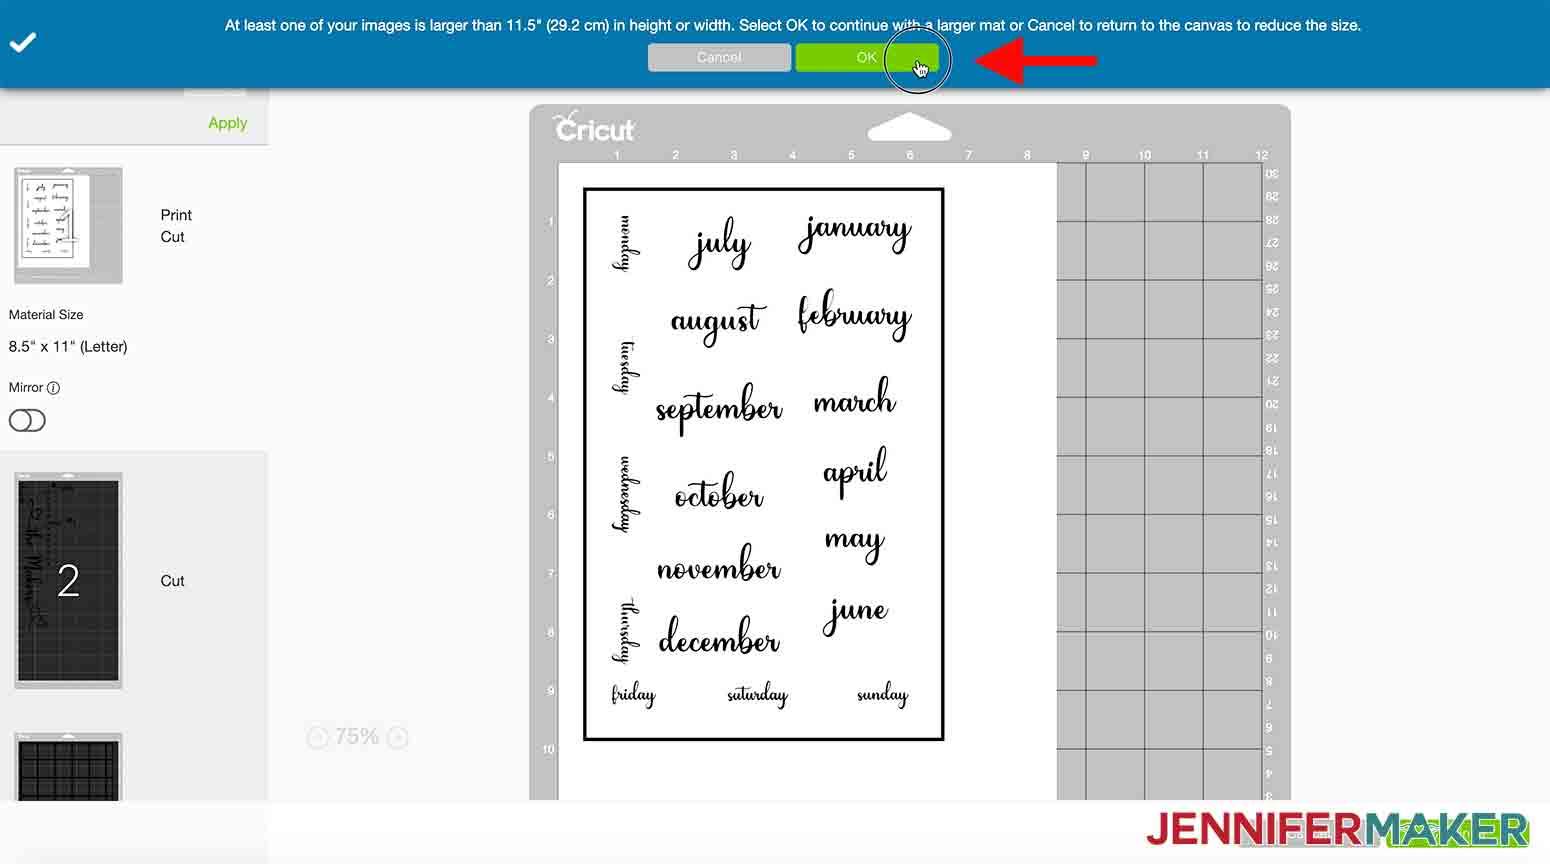 DIY-Whiteboard-Calendar-JenniferMaker-click-ok-at-top